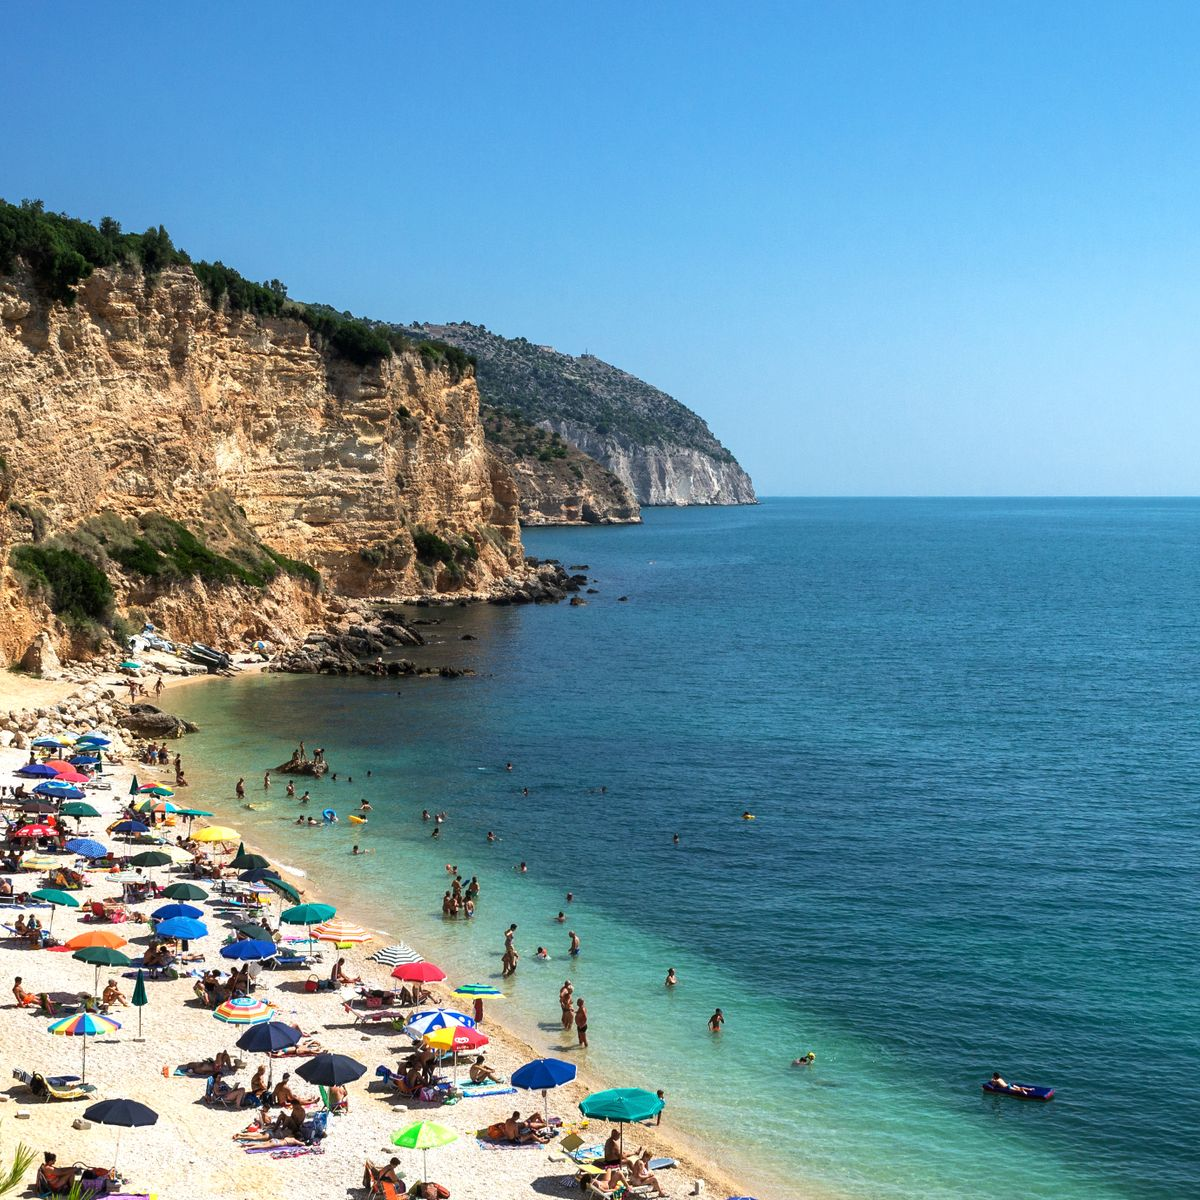 Spiagge del Gargano: Puntarossa Gargano